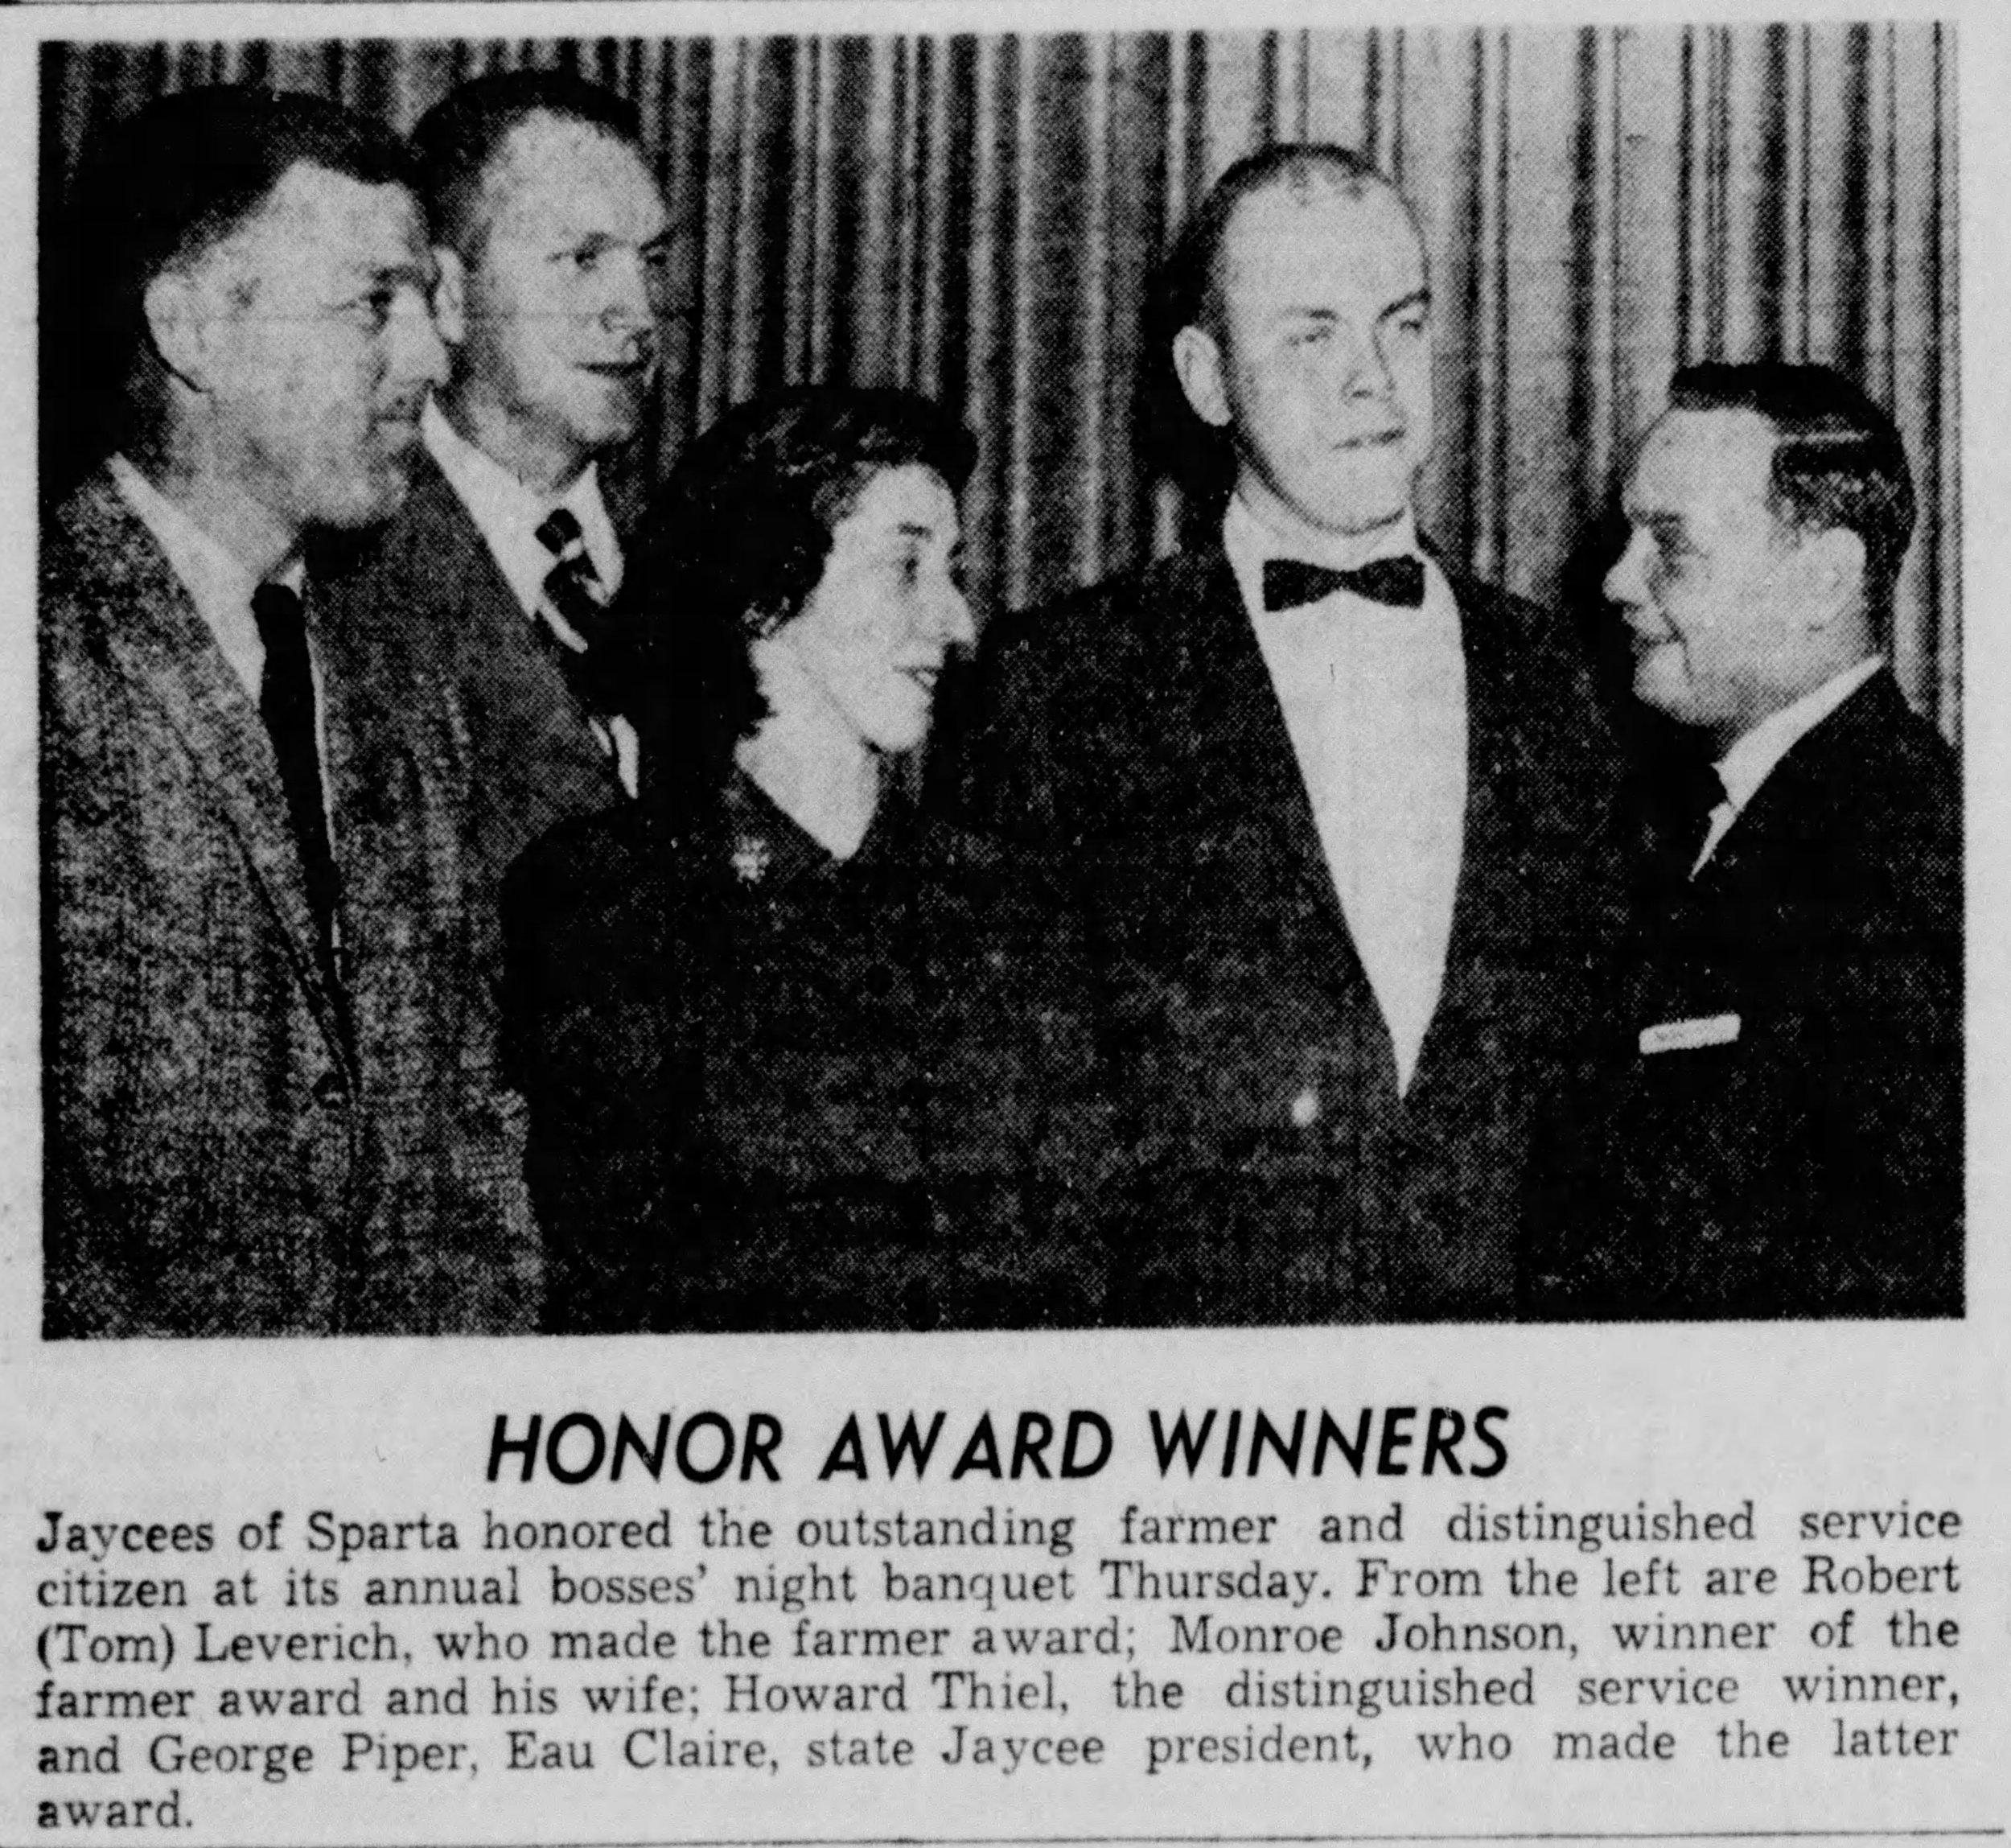 The La Crosse Tribune - February 15, 1959